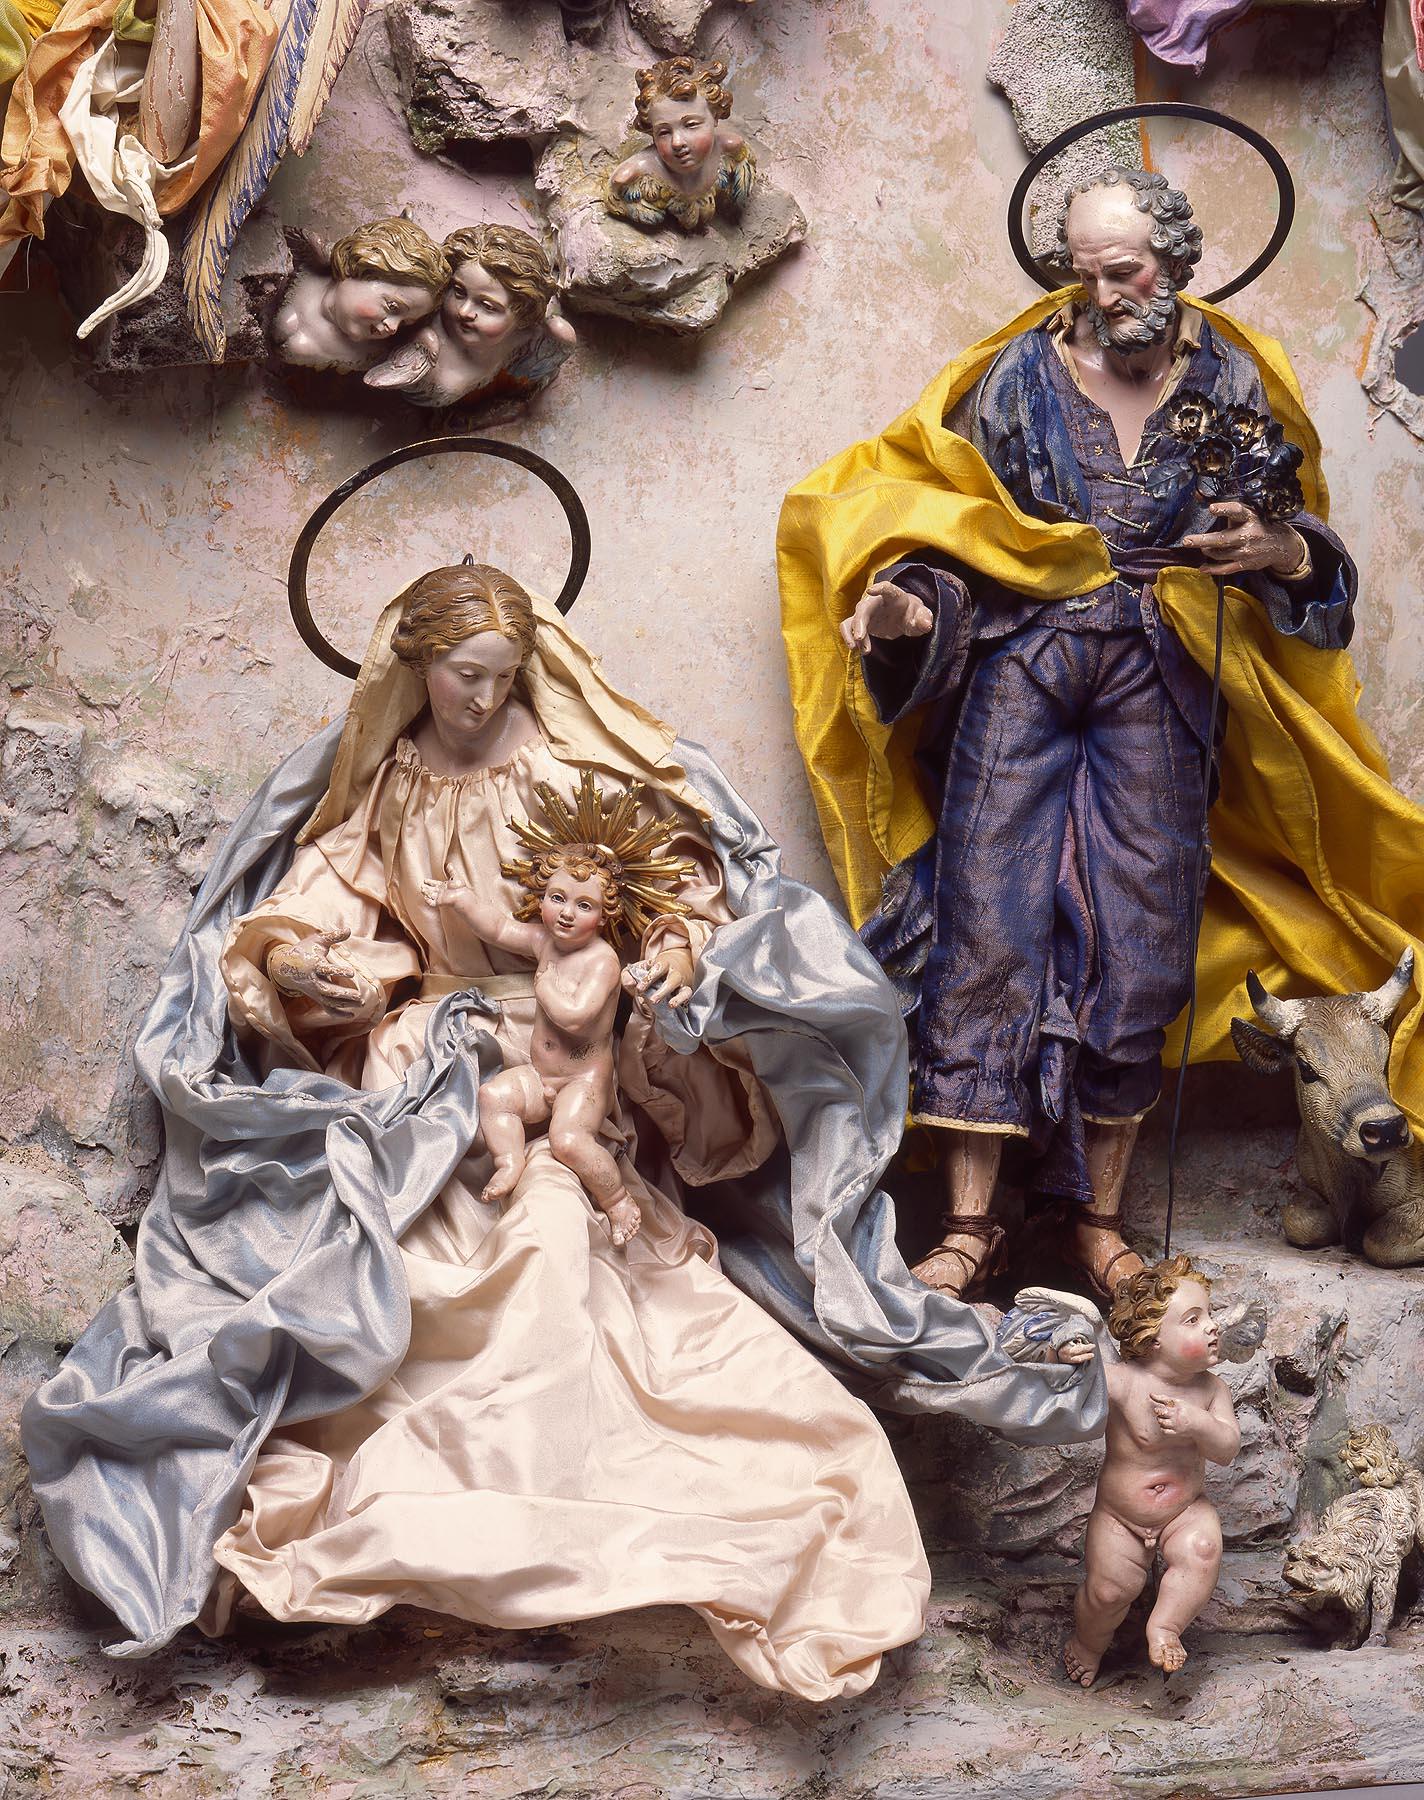 Naples Italy, Crèche (detail), mid-1700s. Milwaukee Art Museum, Gift of Loretta Howard Sturgis. Photo by John R. Glembin.